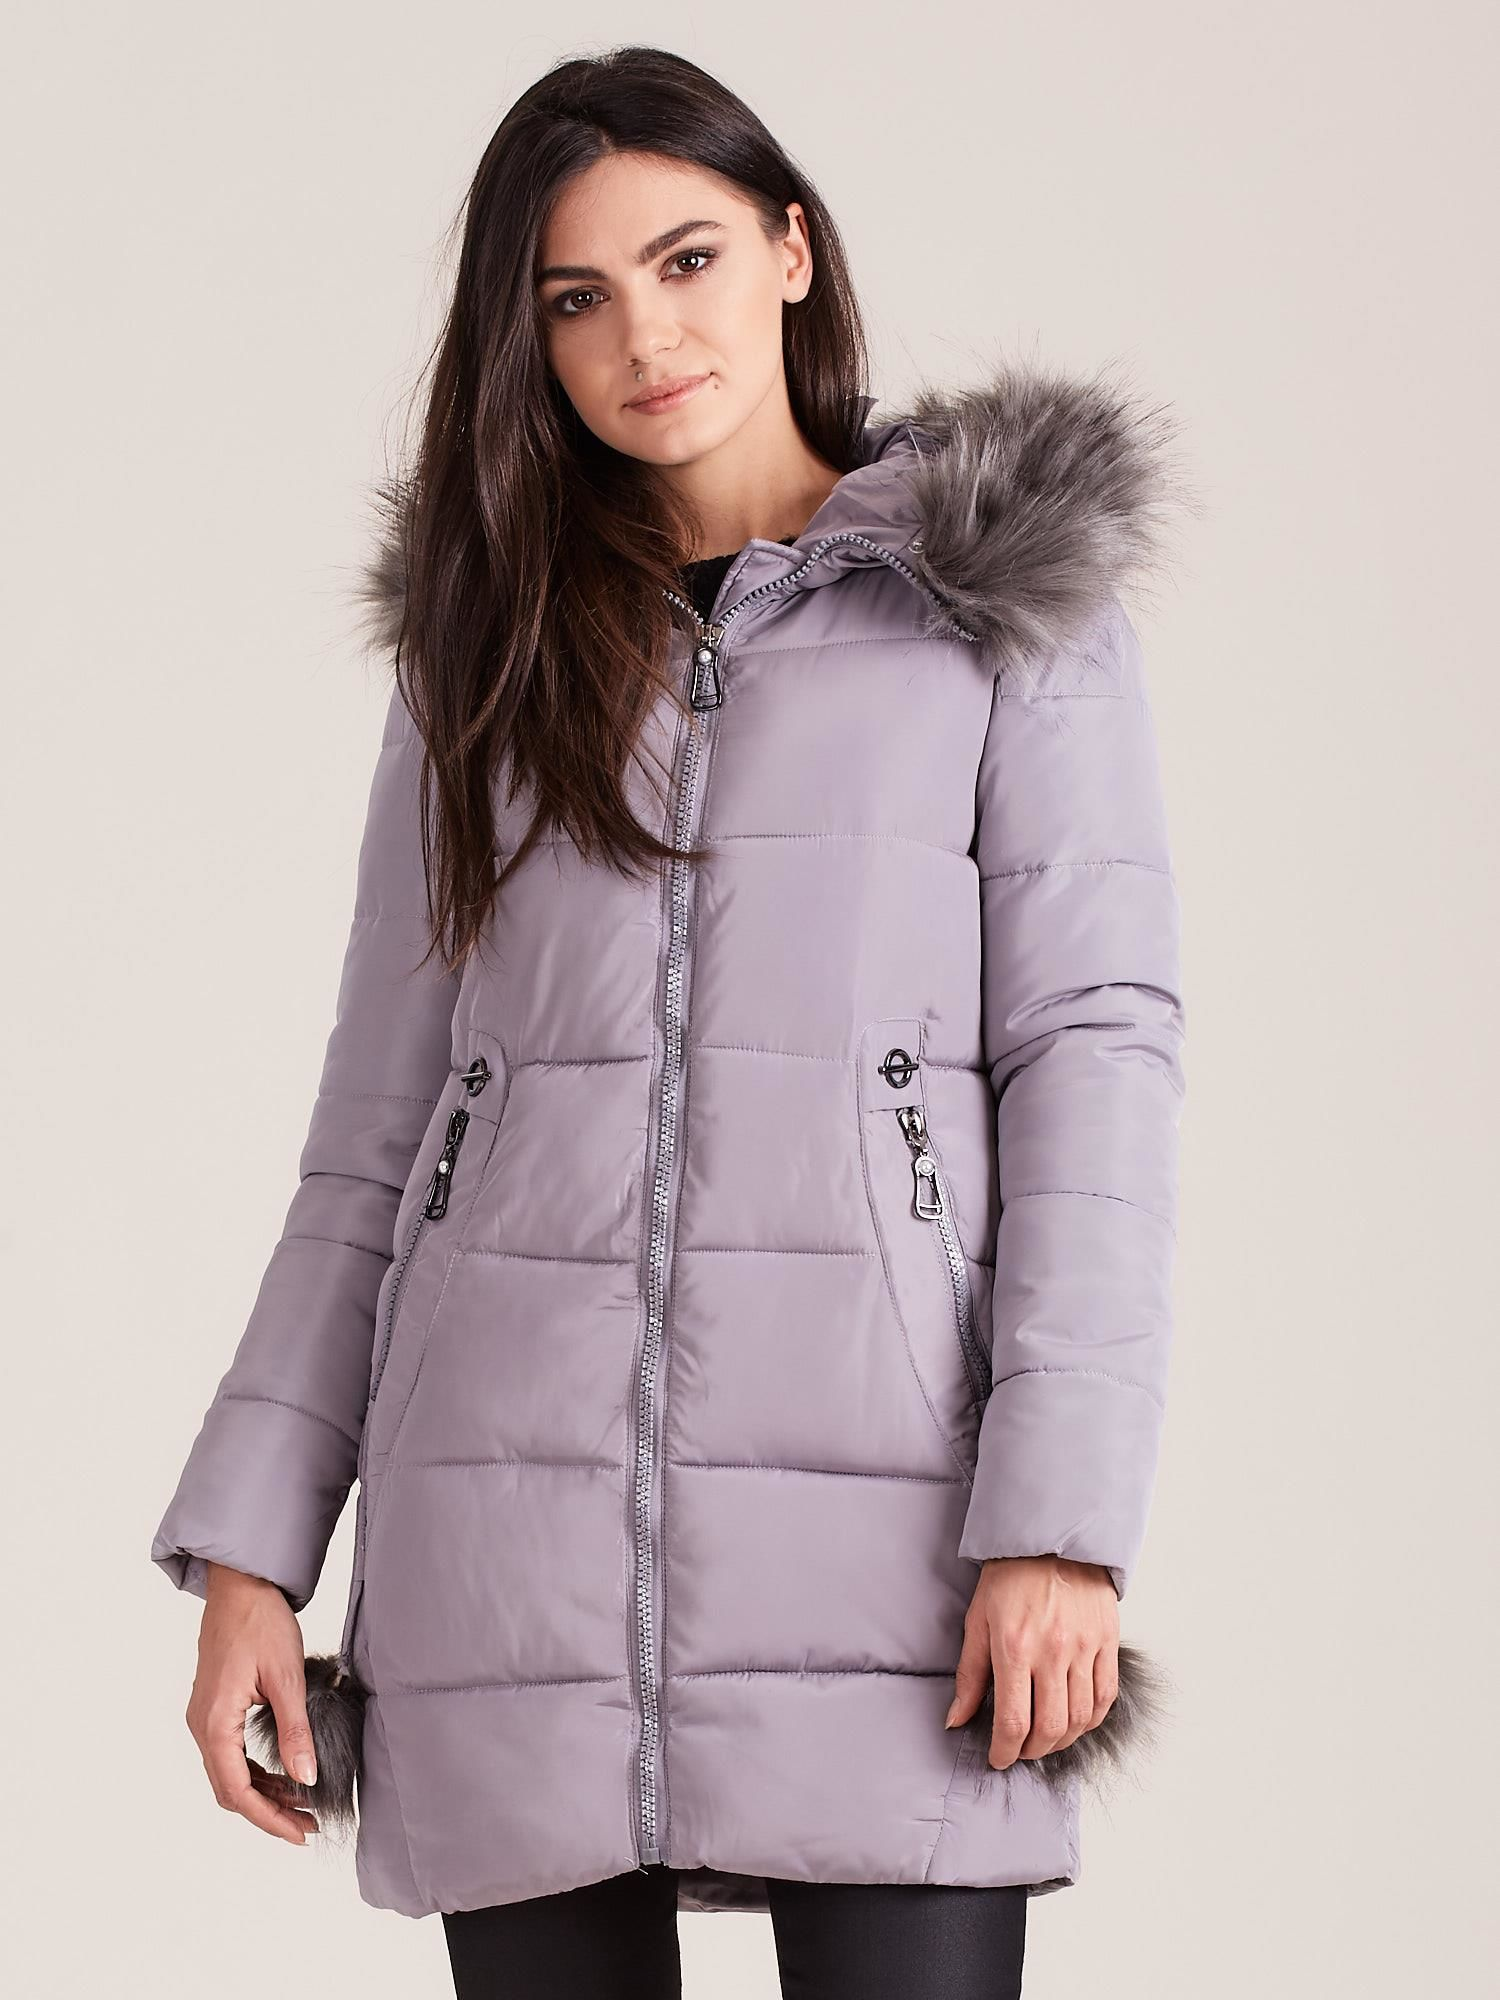 Dámska zimná prešívaná bunda - XXL